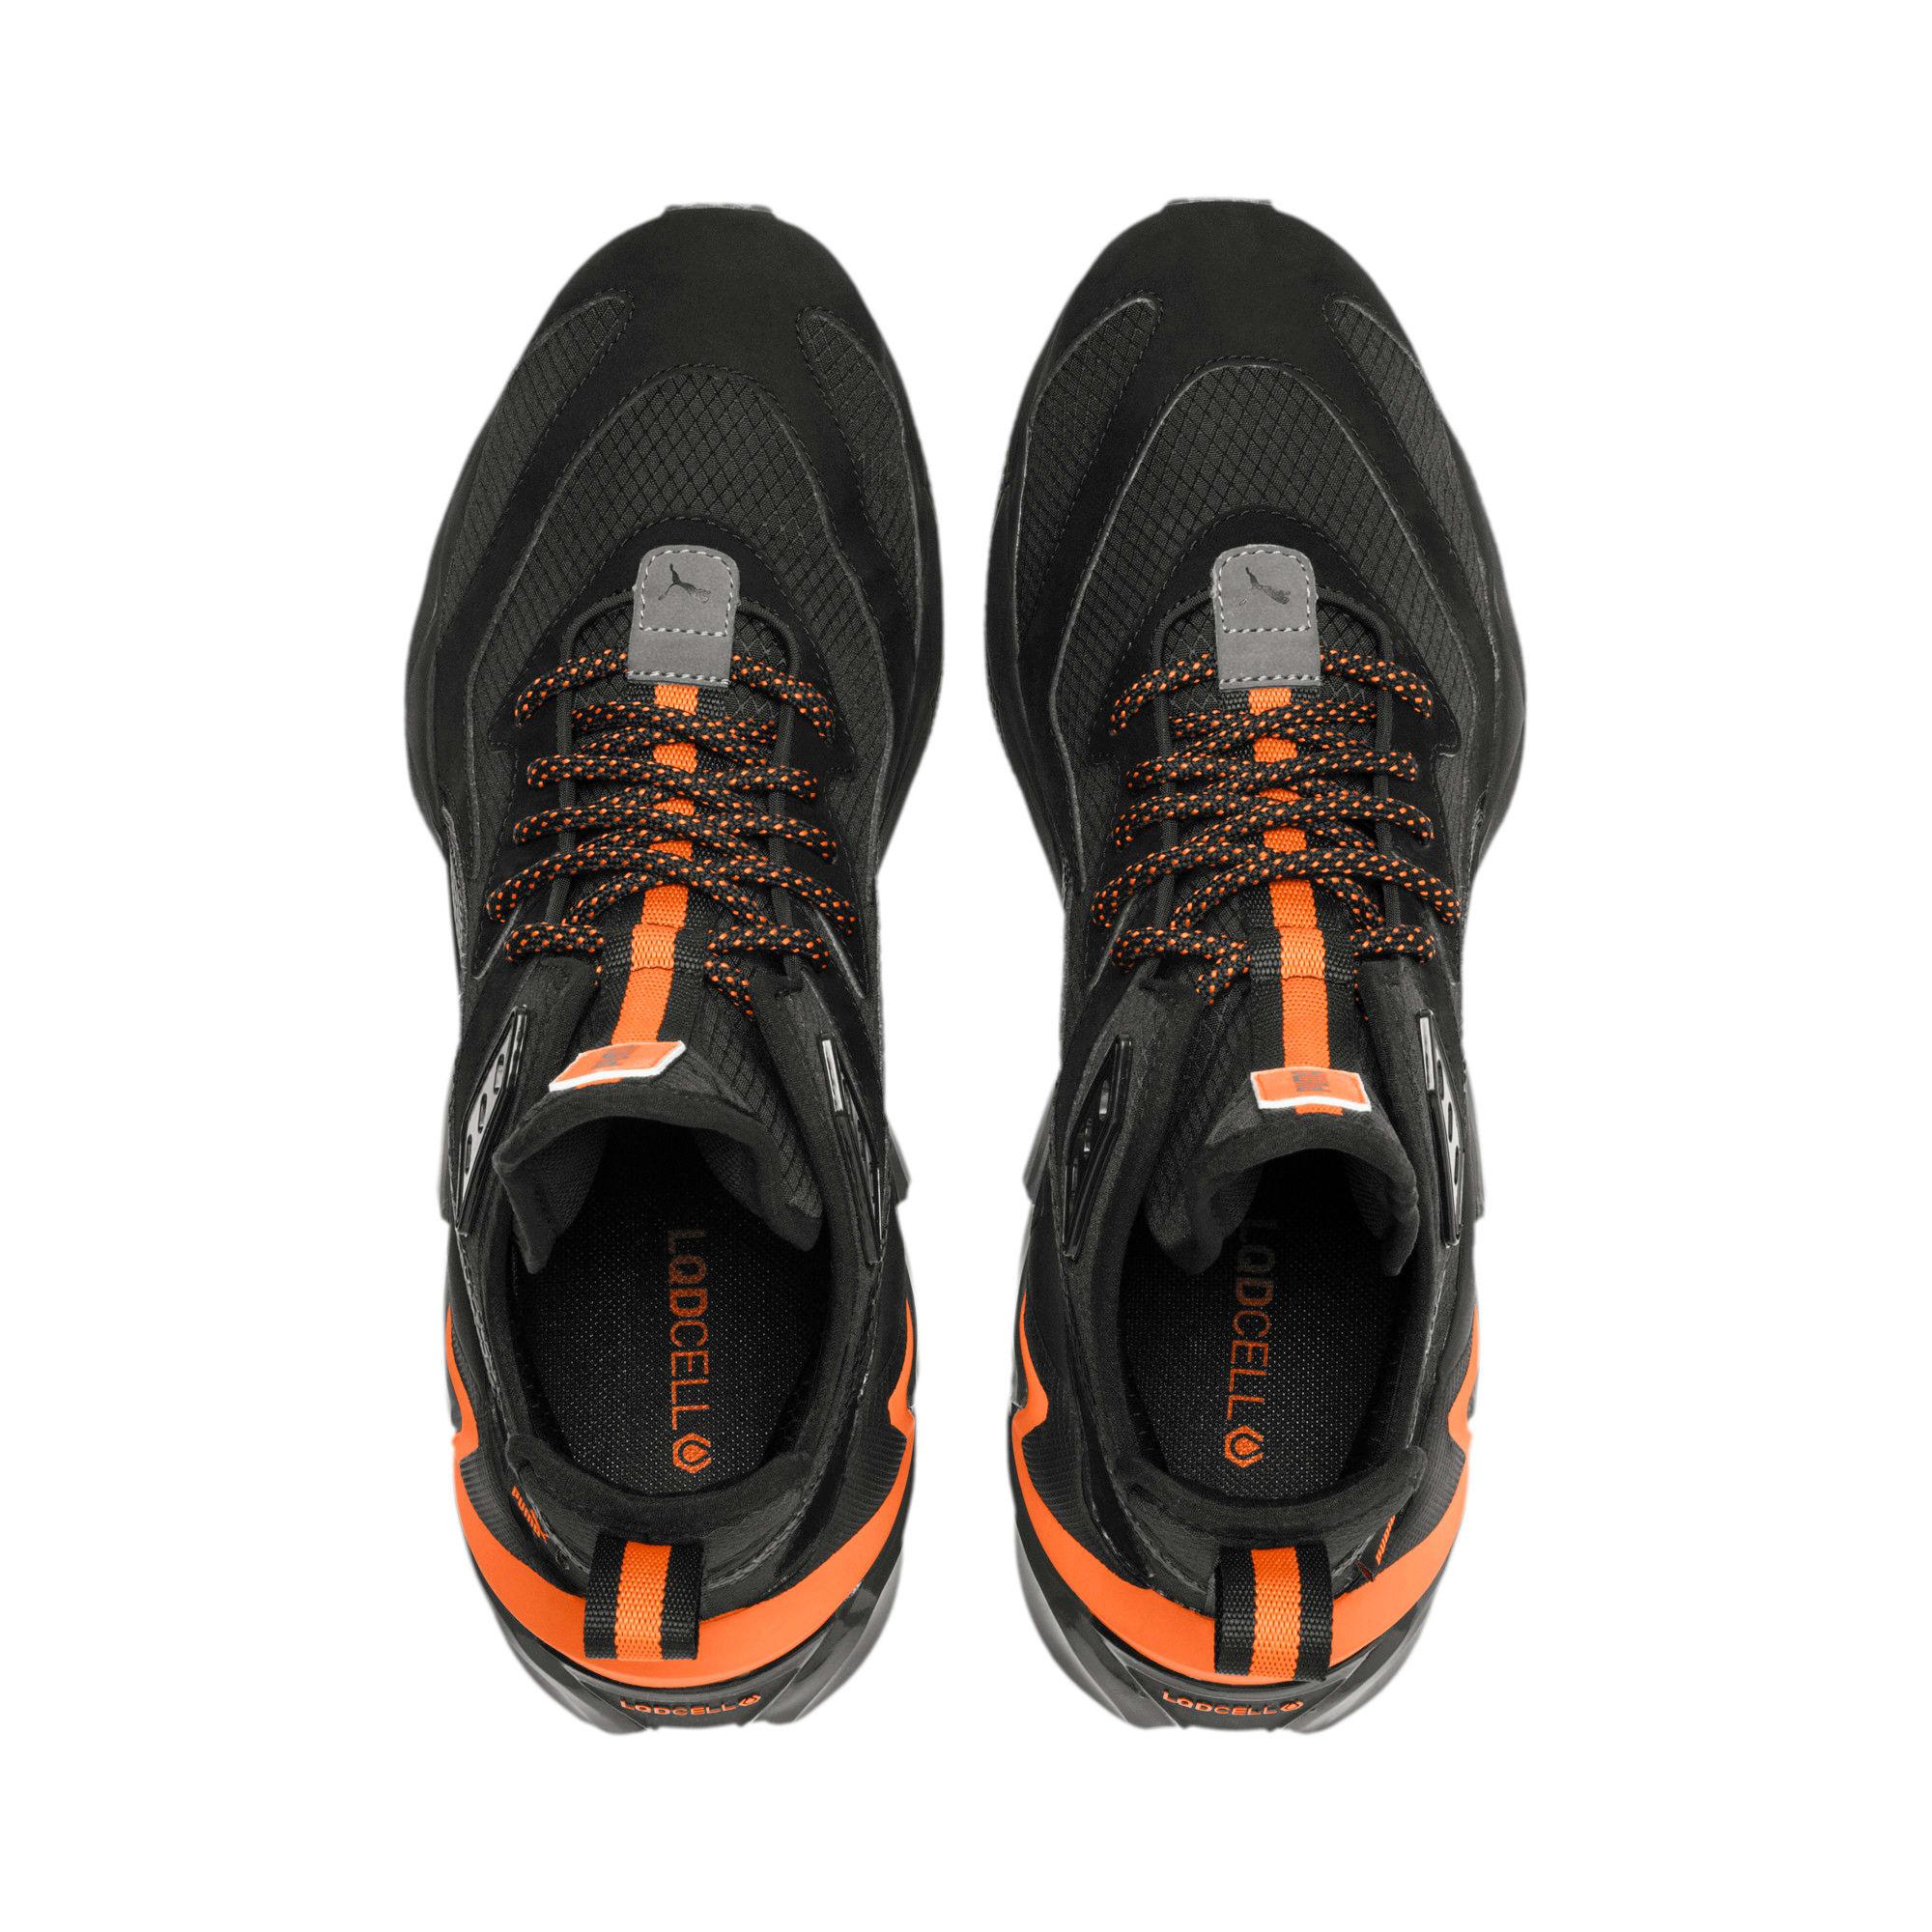 Thumbnail 7 of LQDCELL Origin Terrain Men's Training Shoes, Puma Black-Jaffa Orange, medium